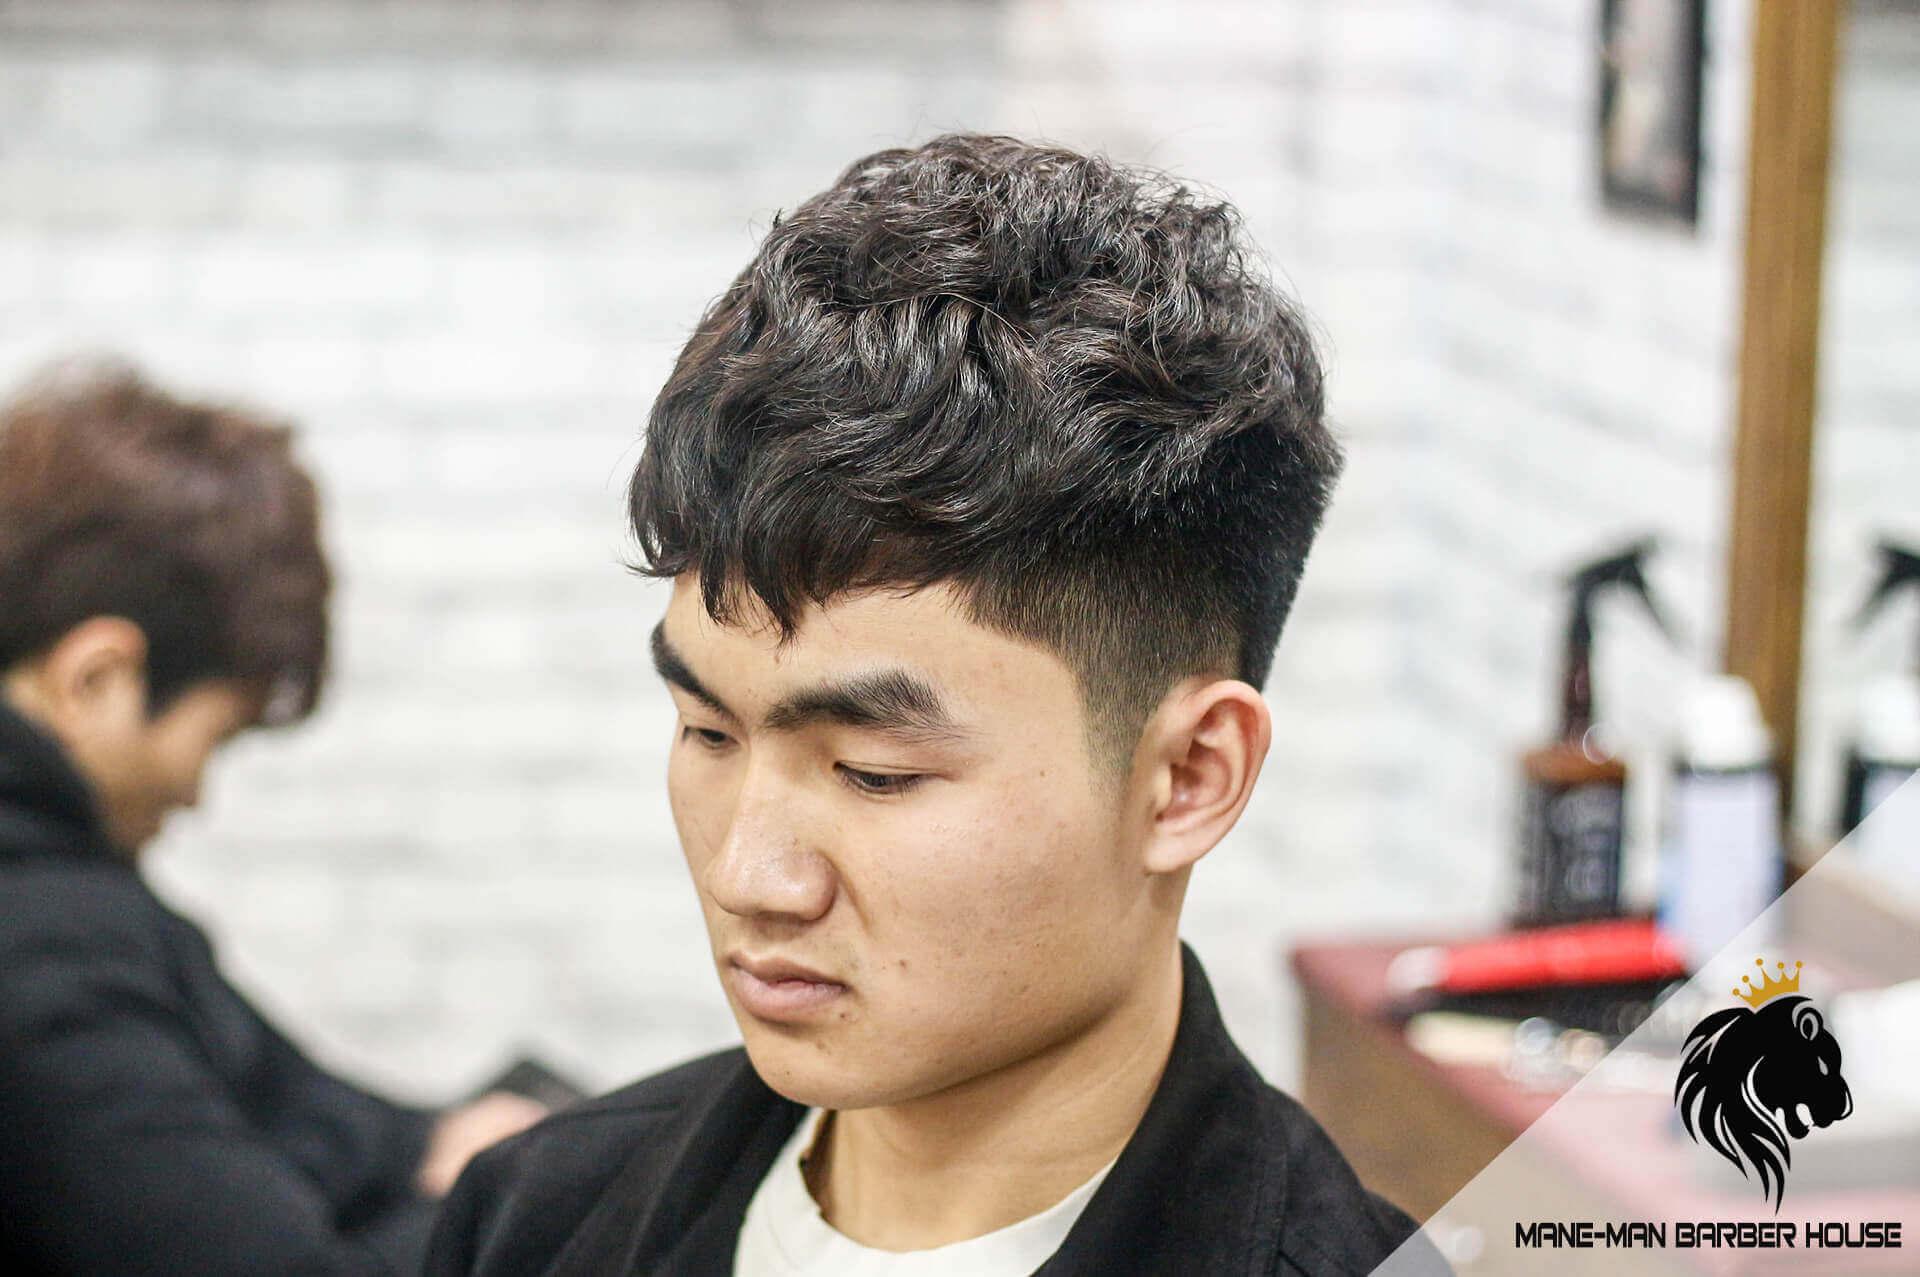 Kiểu tóc Textured